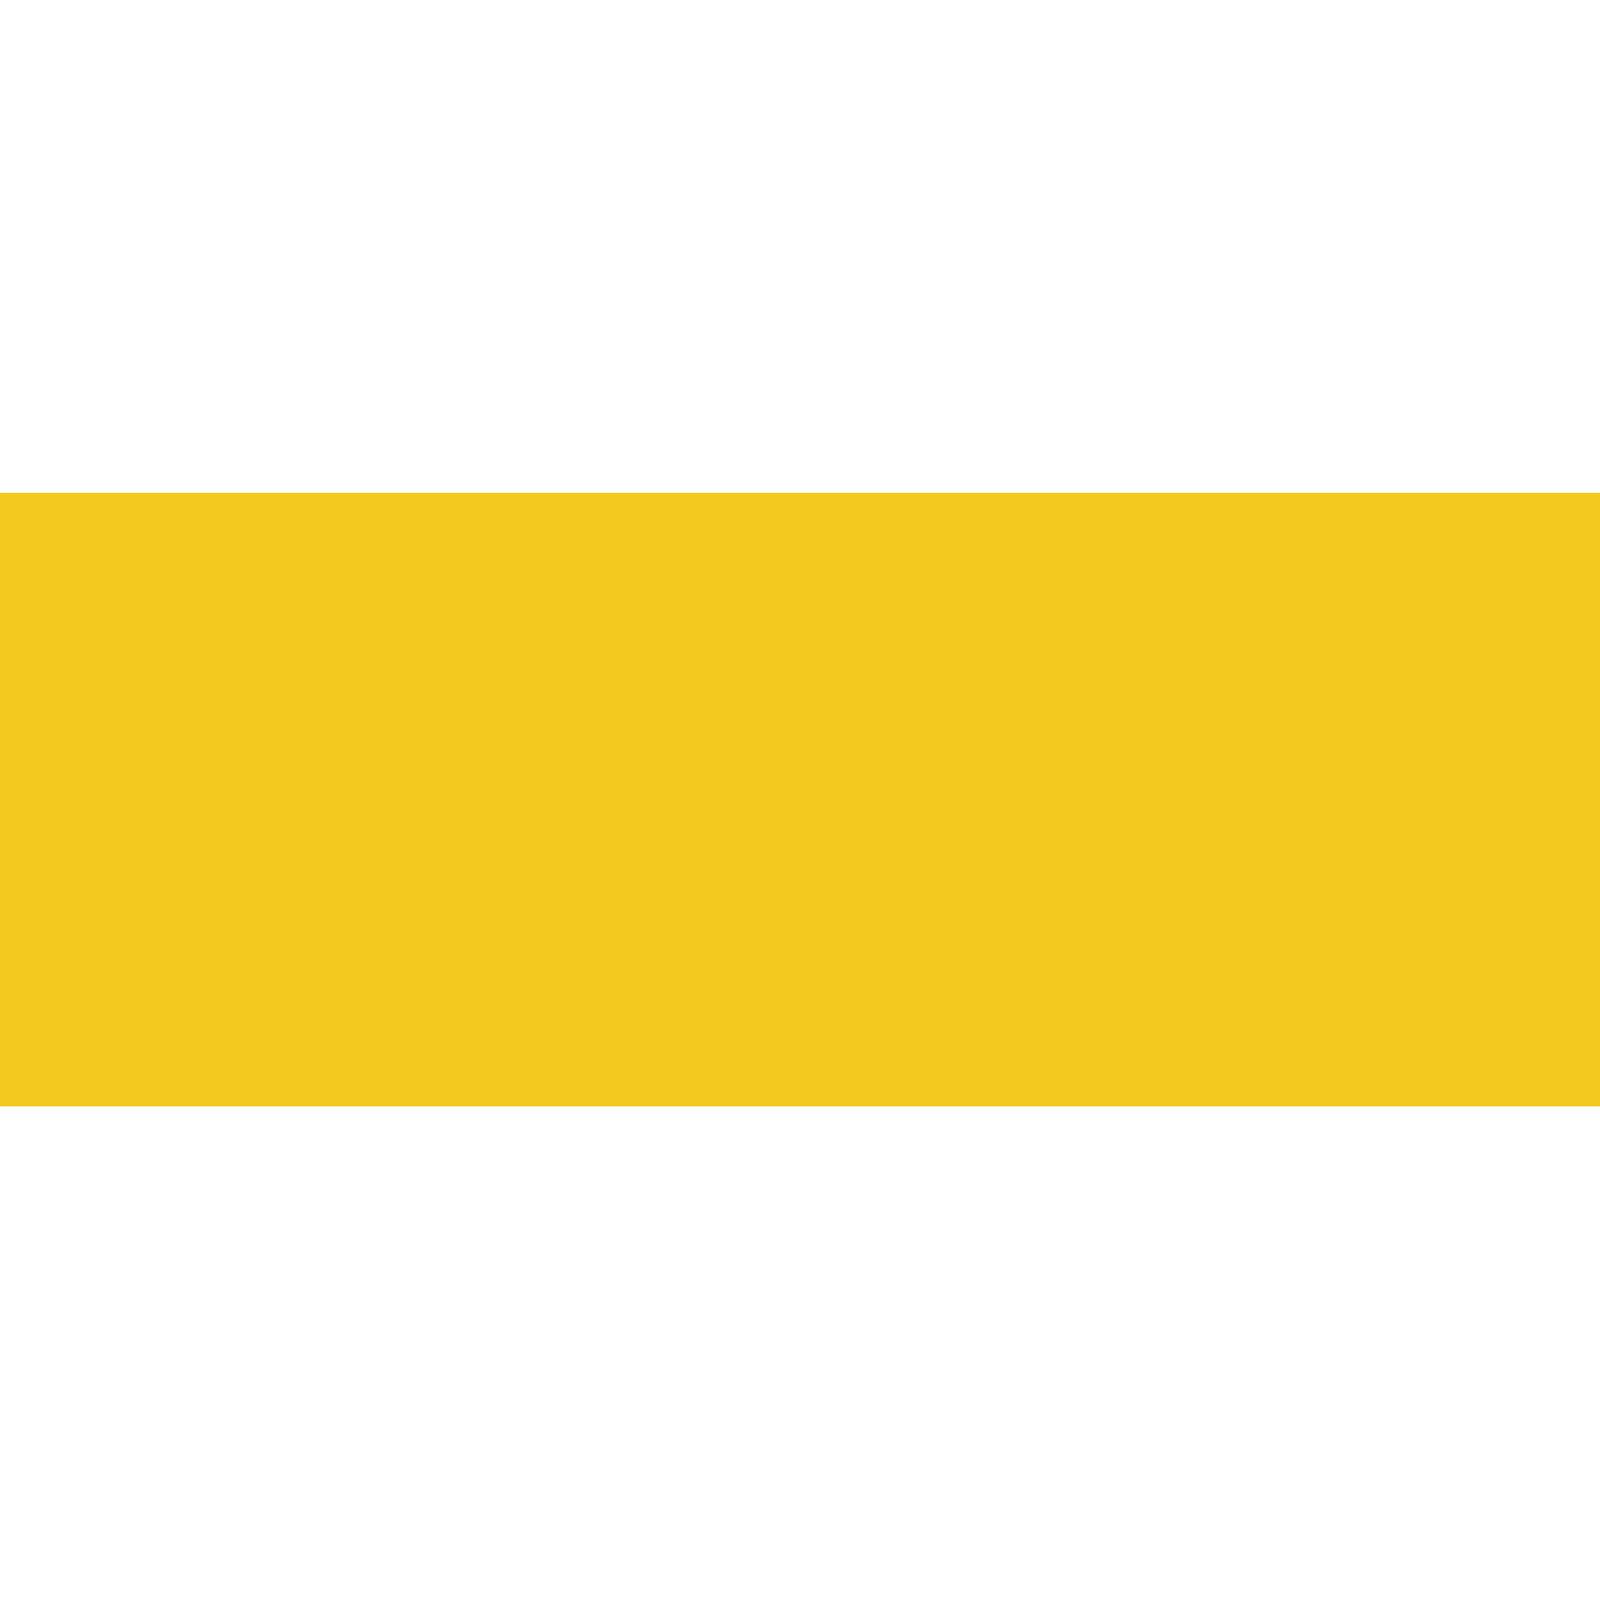 UltraCote 10 Meter, Bright Yellow